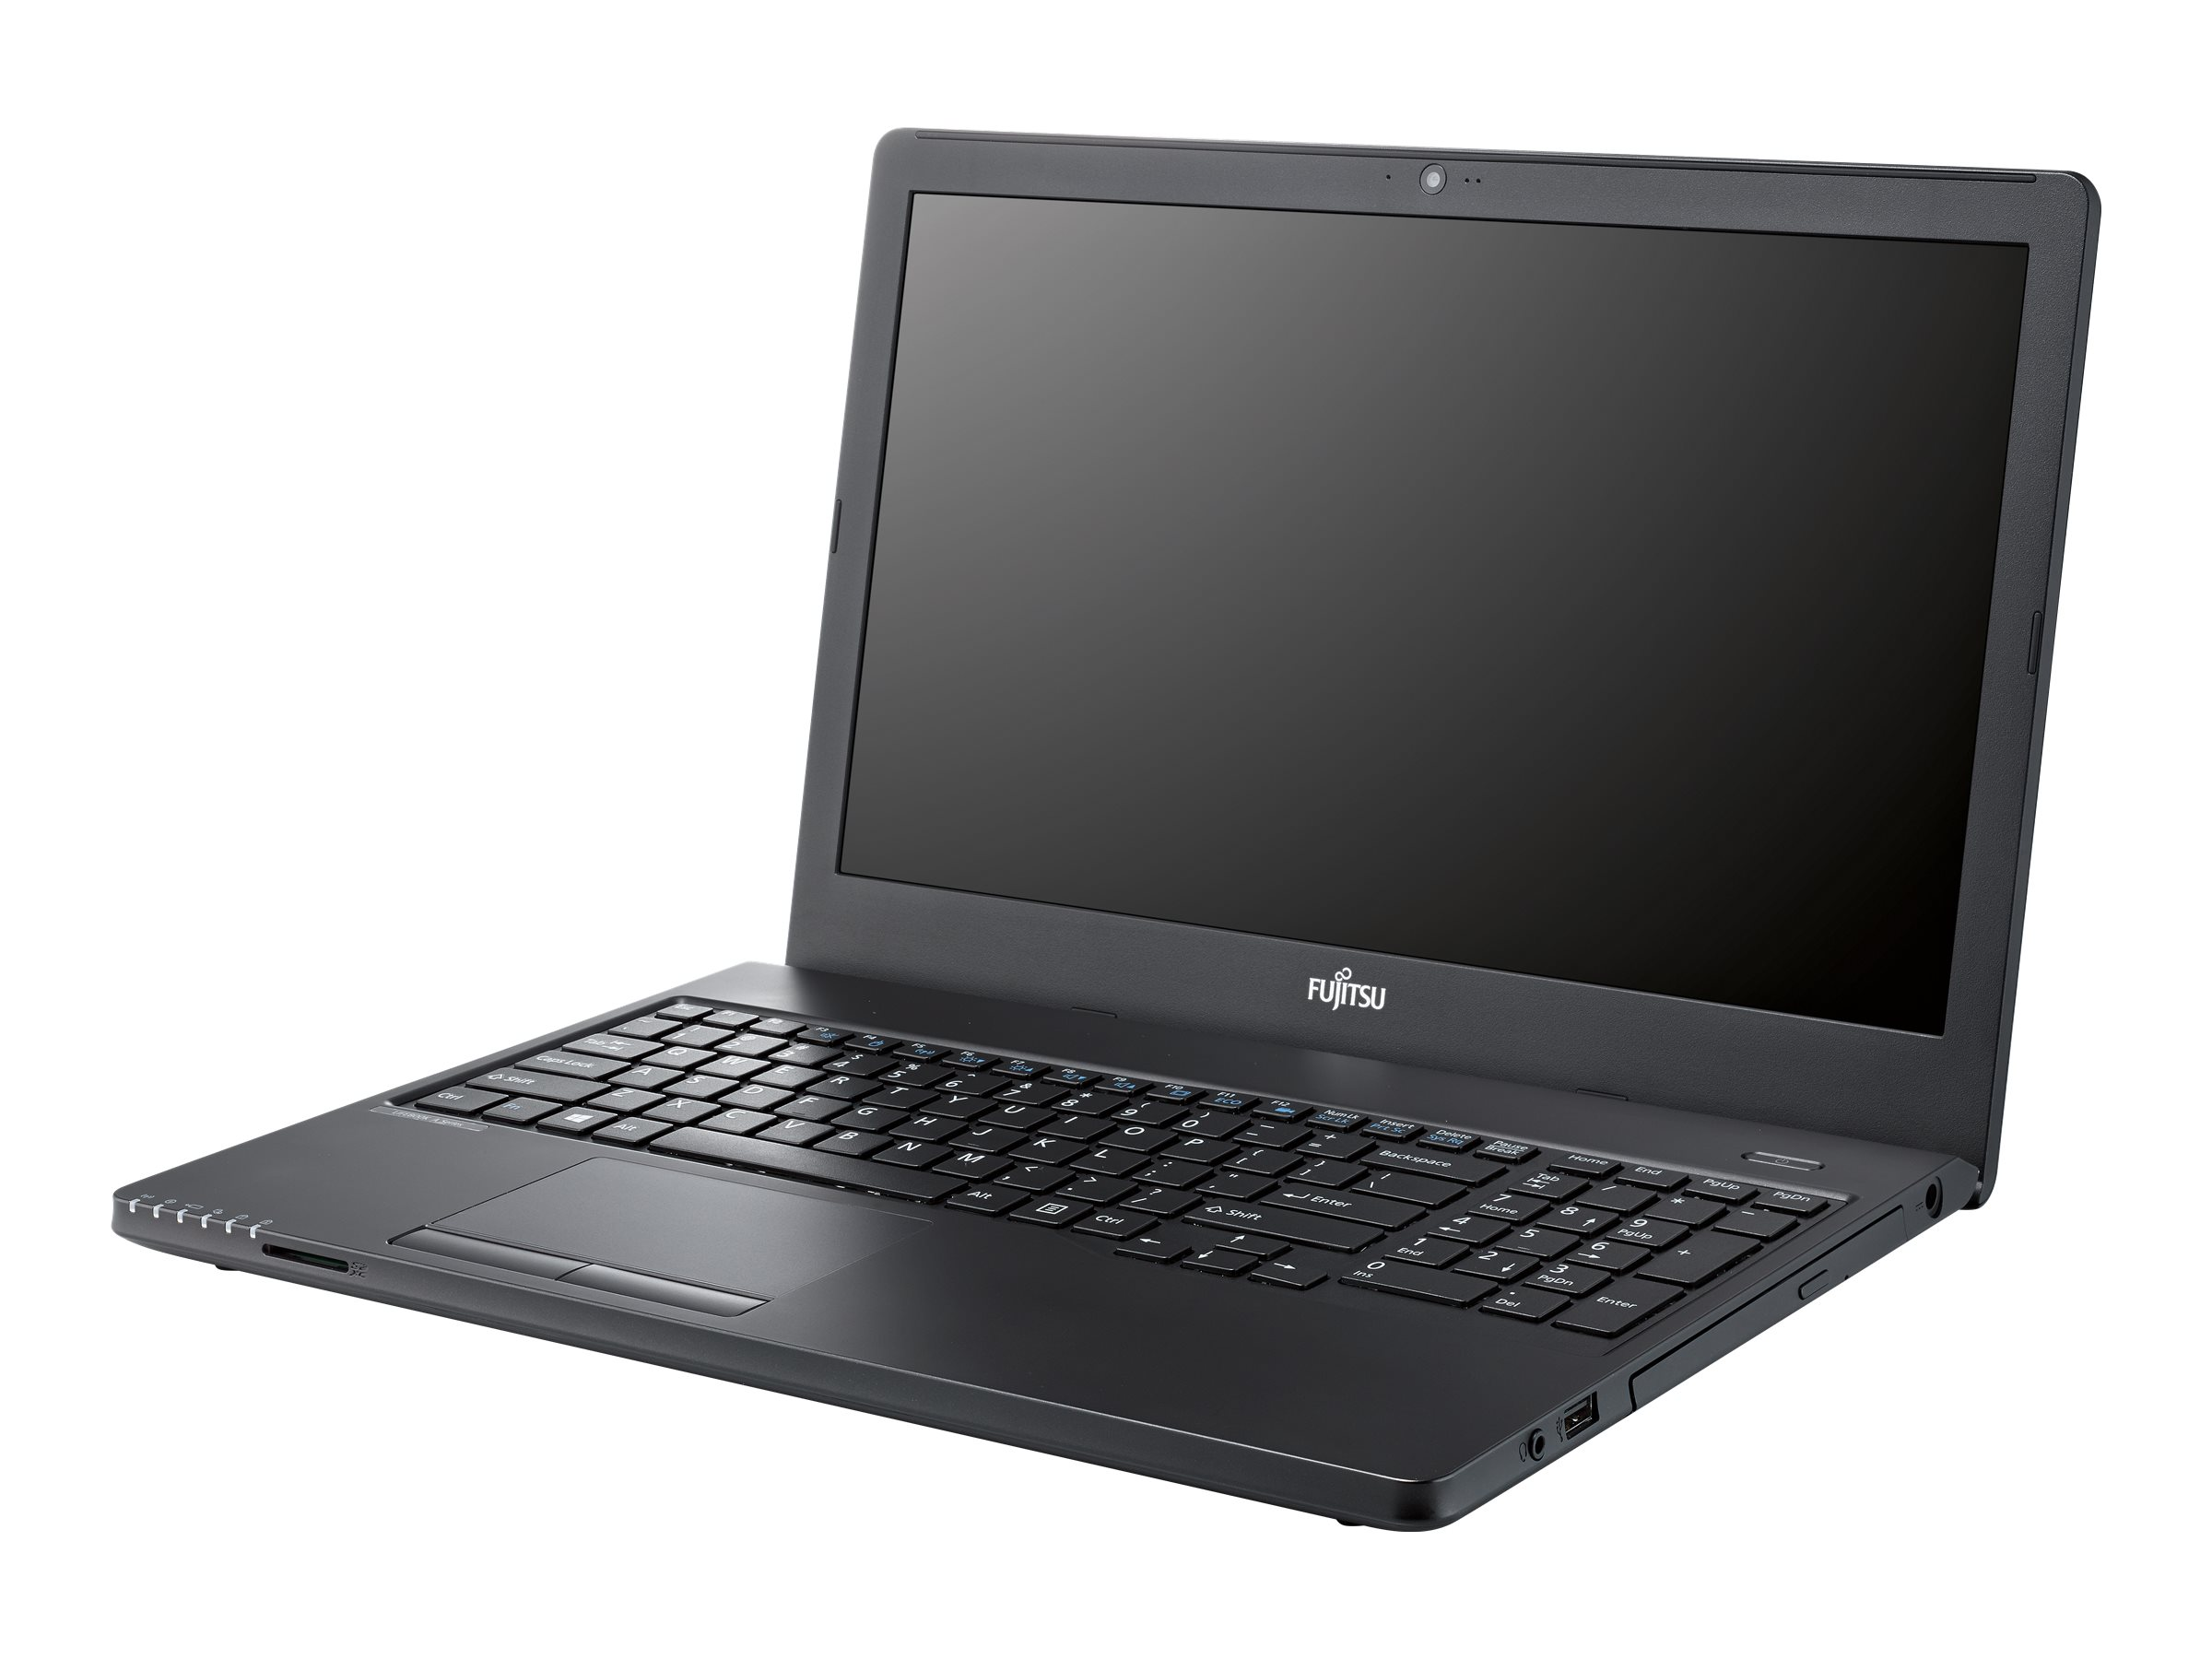 "Fujitsu LIFEBOOK A359 - Core i3 8130U / 2.2 GHz - Win 10 Pro - 8 GB RAM - 512 GB SSD - DVD SuperMulti - 39.6 cm (15.6"")"